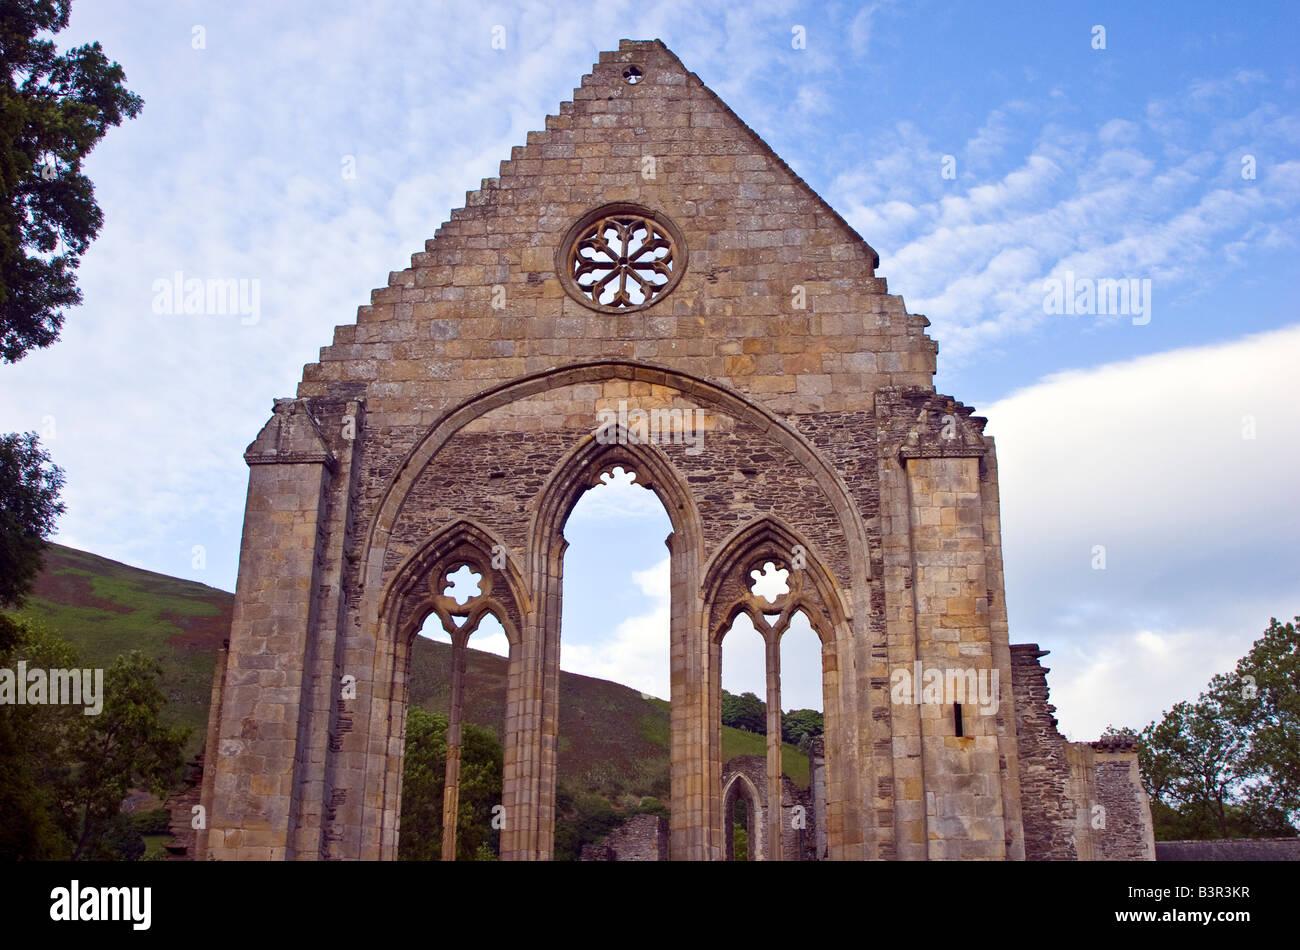 Valle Crucis a 13th century Abbey near Llangollen, Denbighshire Wales UK 2008 Stock Photo